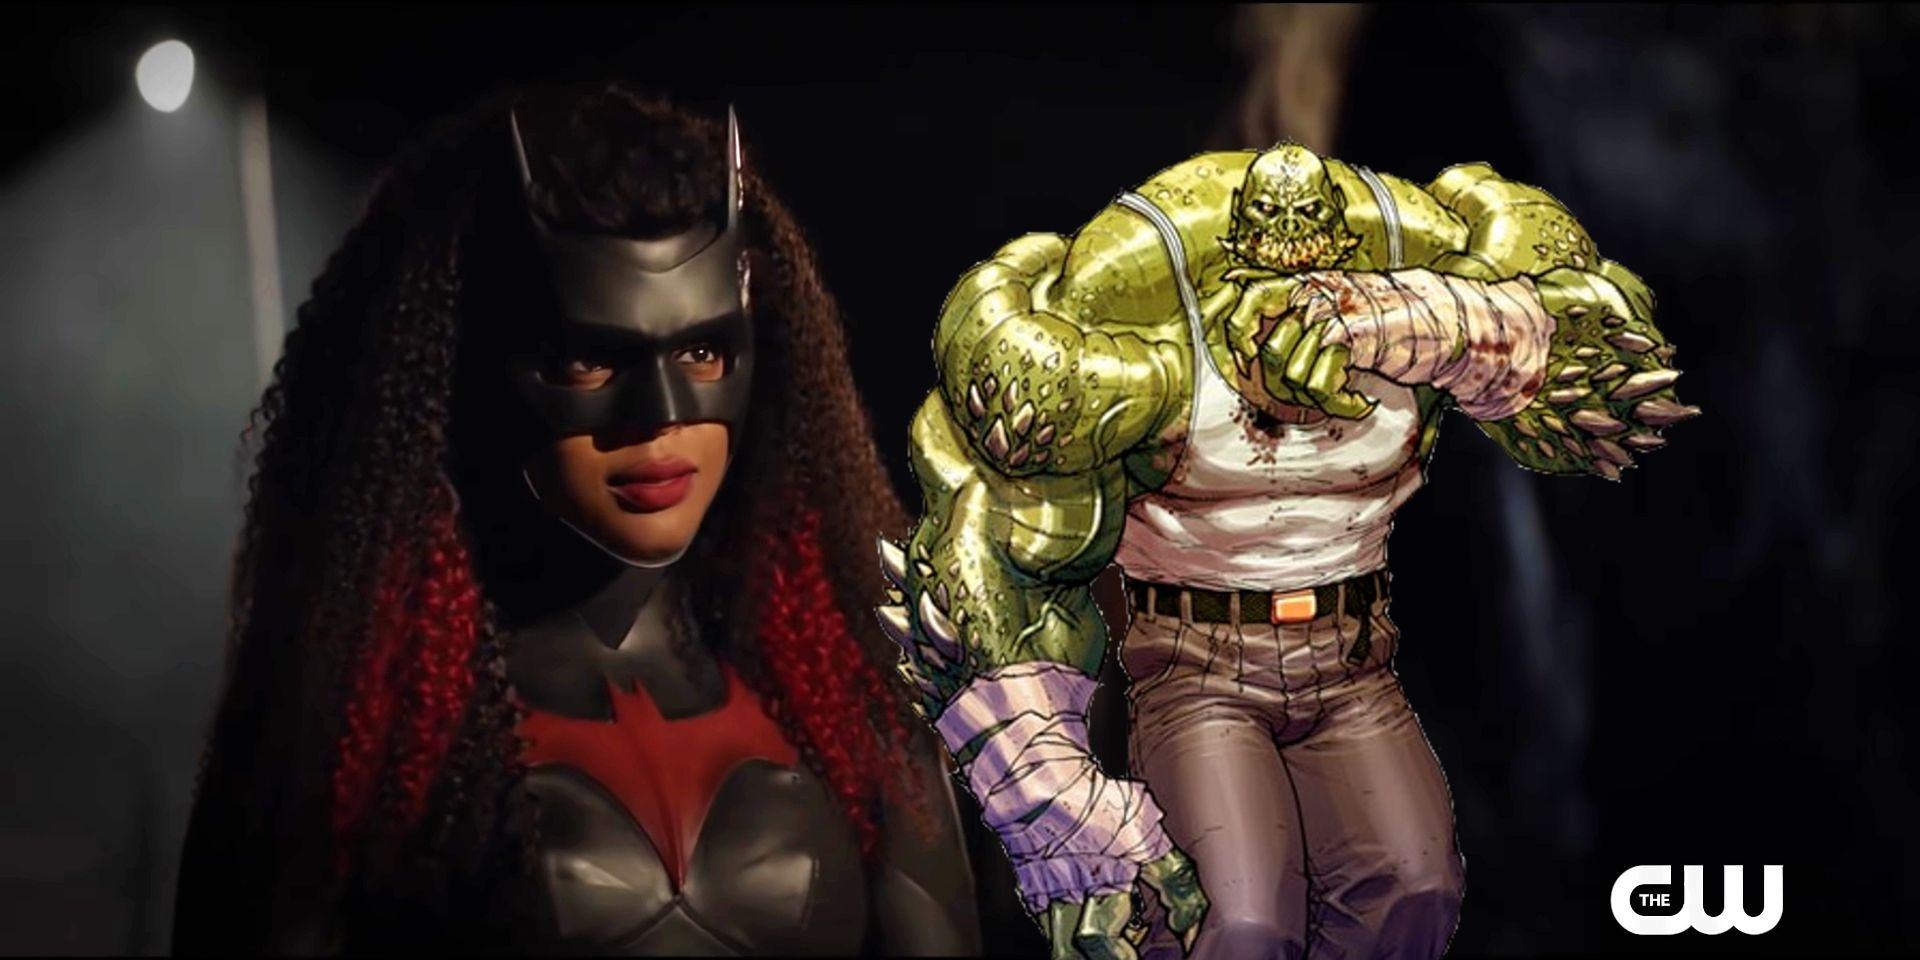 Batwoman Season 3 Episode 2 Synopsis Confirms Killer Croc Appearance